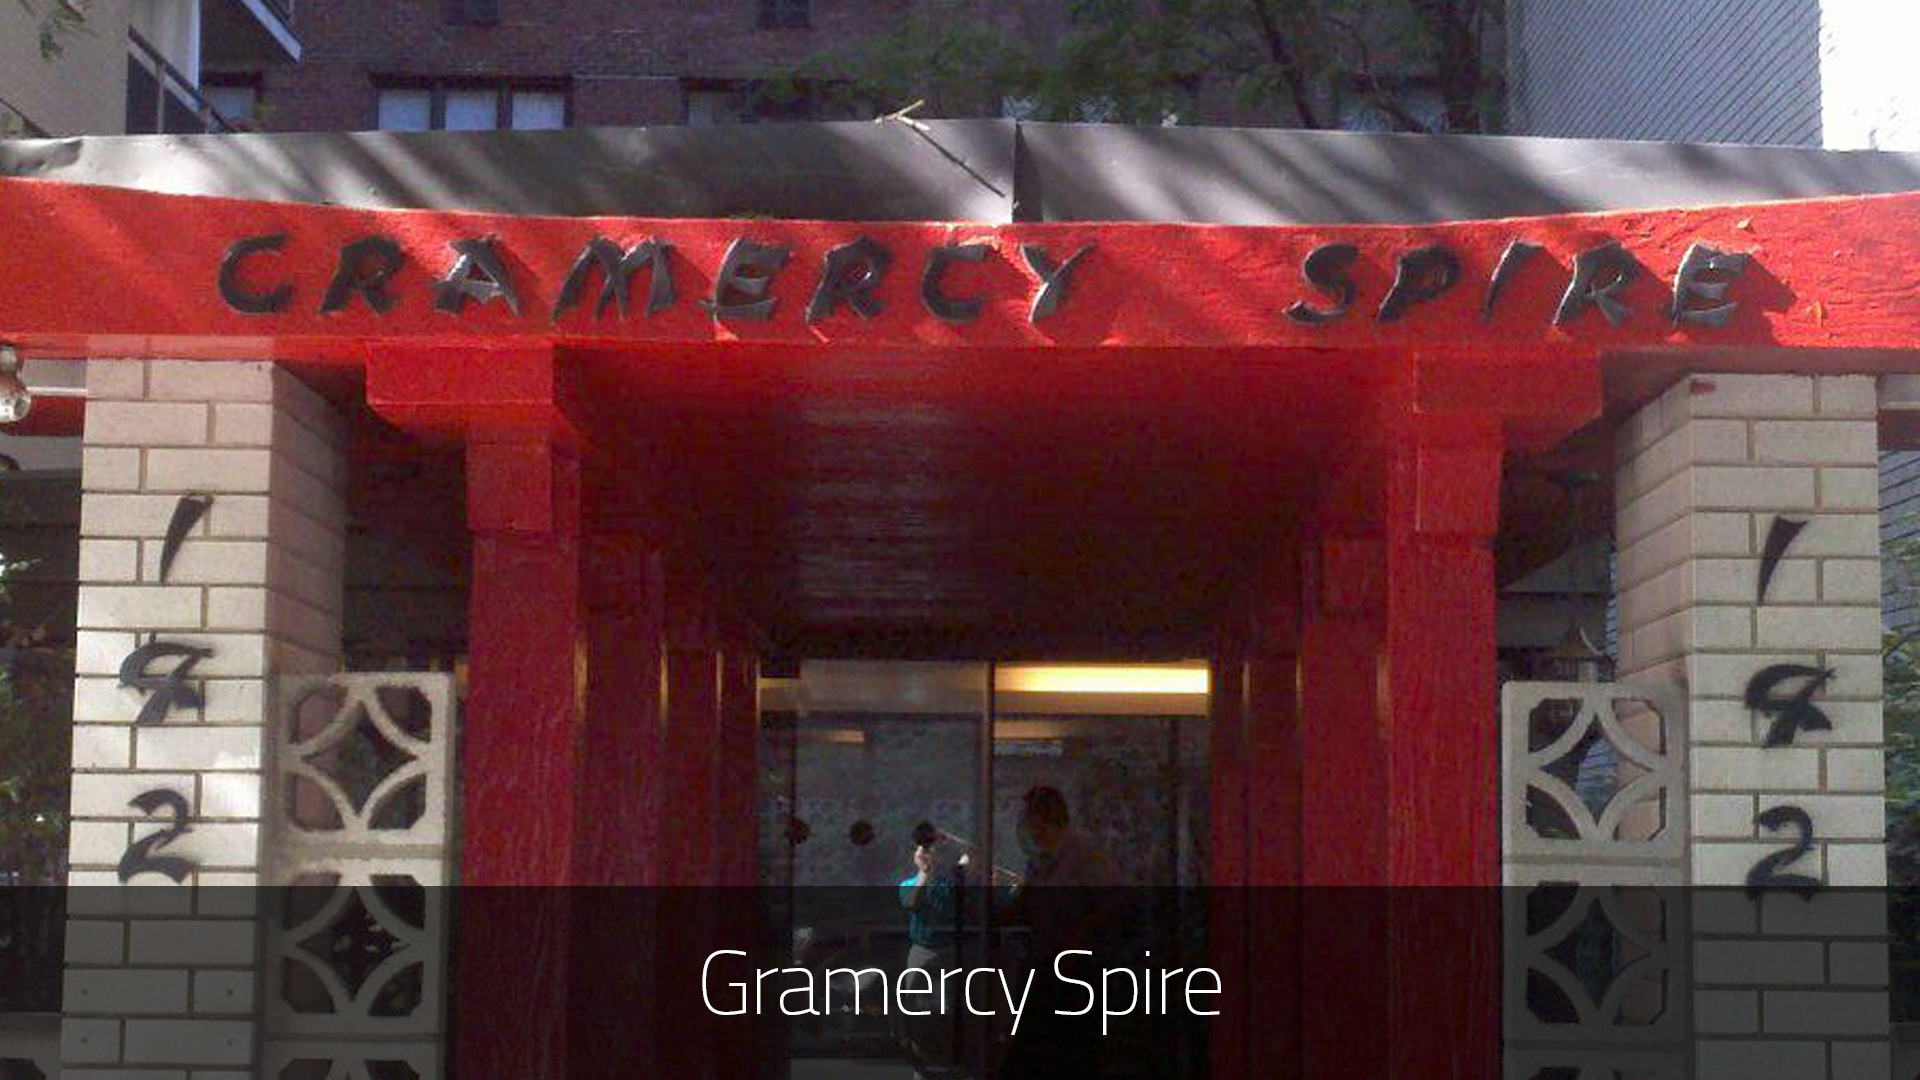 Gramercy spire